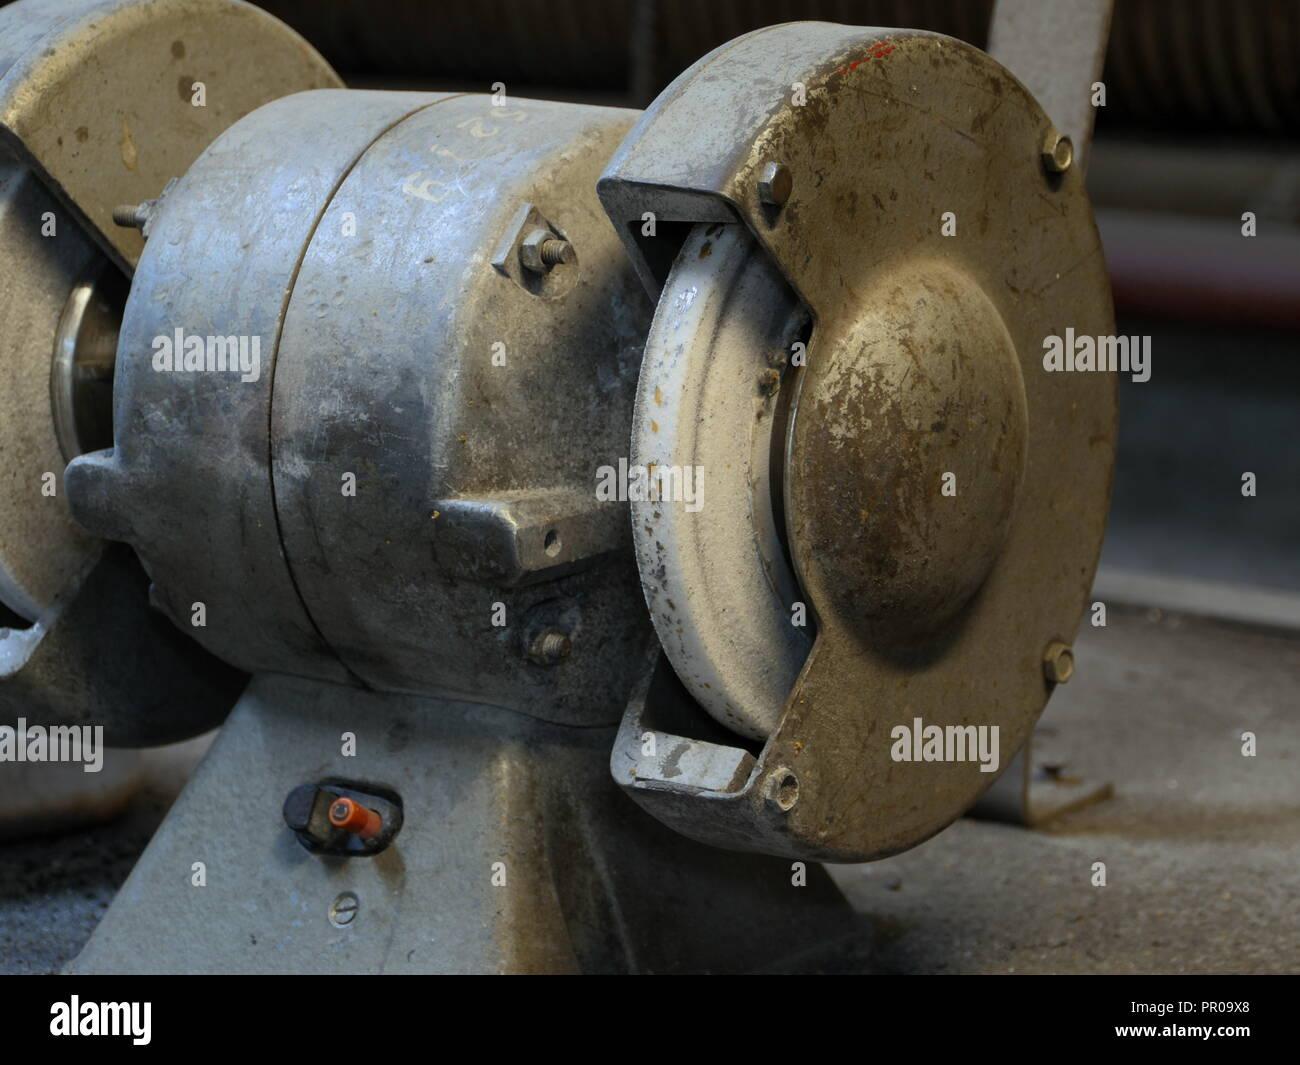 old sharpened machine in workshop - Stock Image